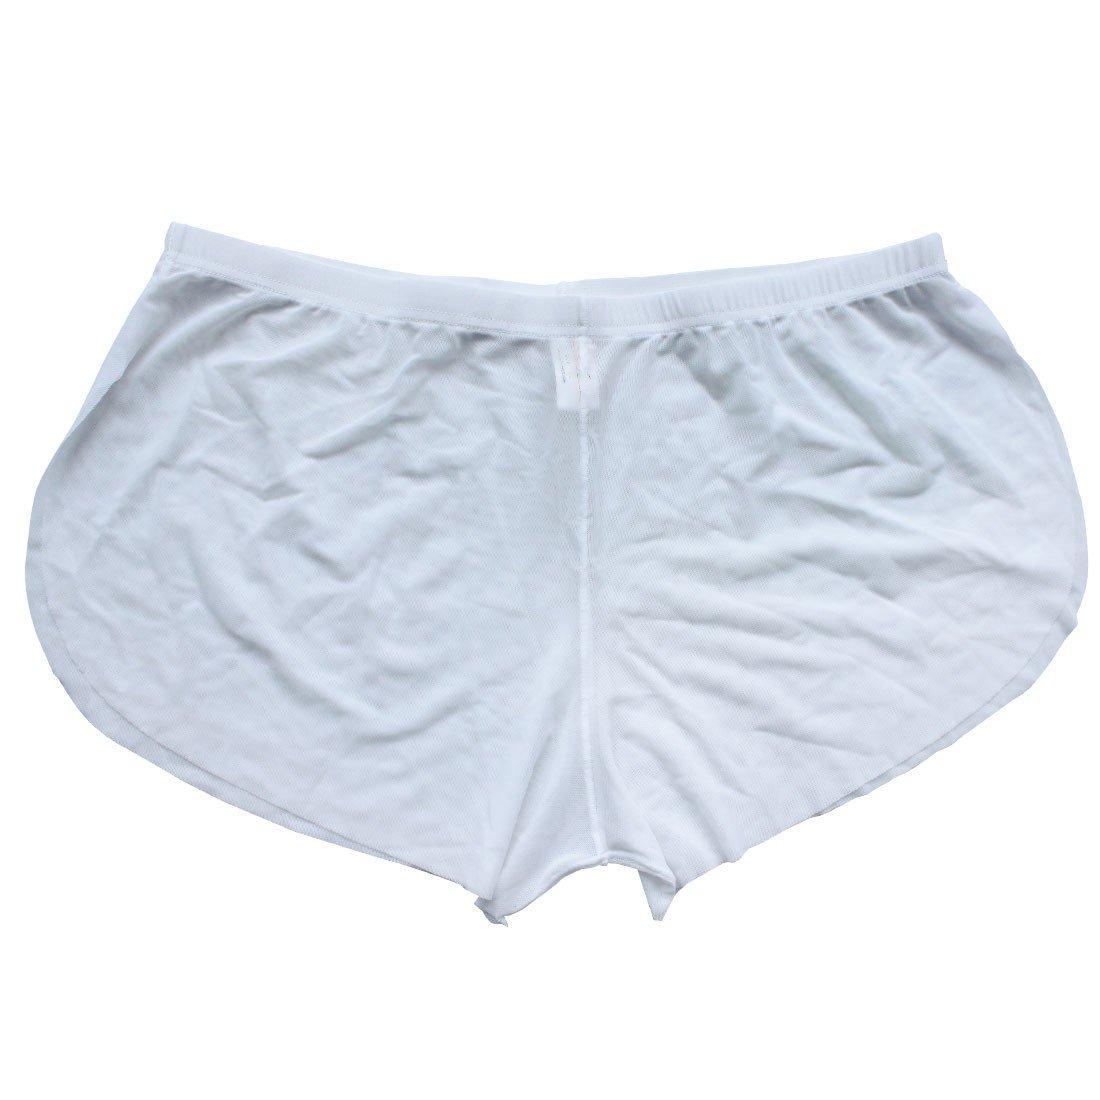 Waistline 27.0-41.0 FEESHOW Mens Soft Sheer Mesh Boxer Briefs Shorts Underwear Swim Trunks White Medium